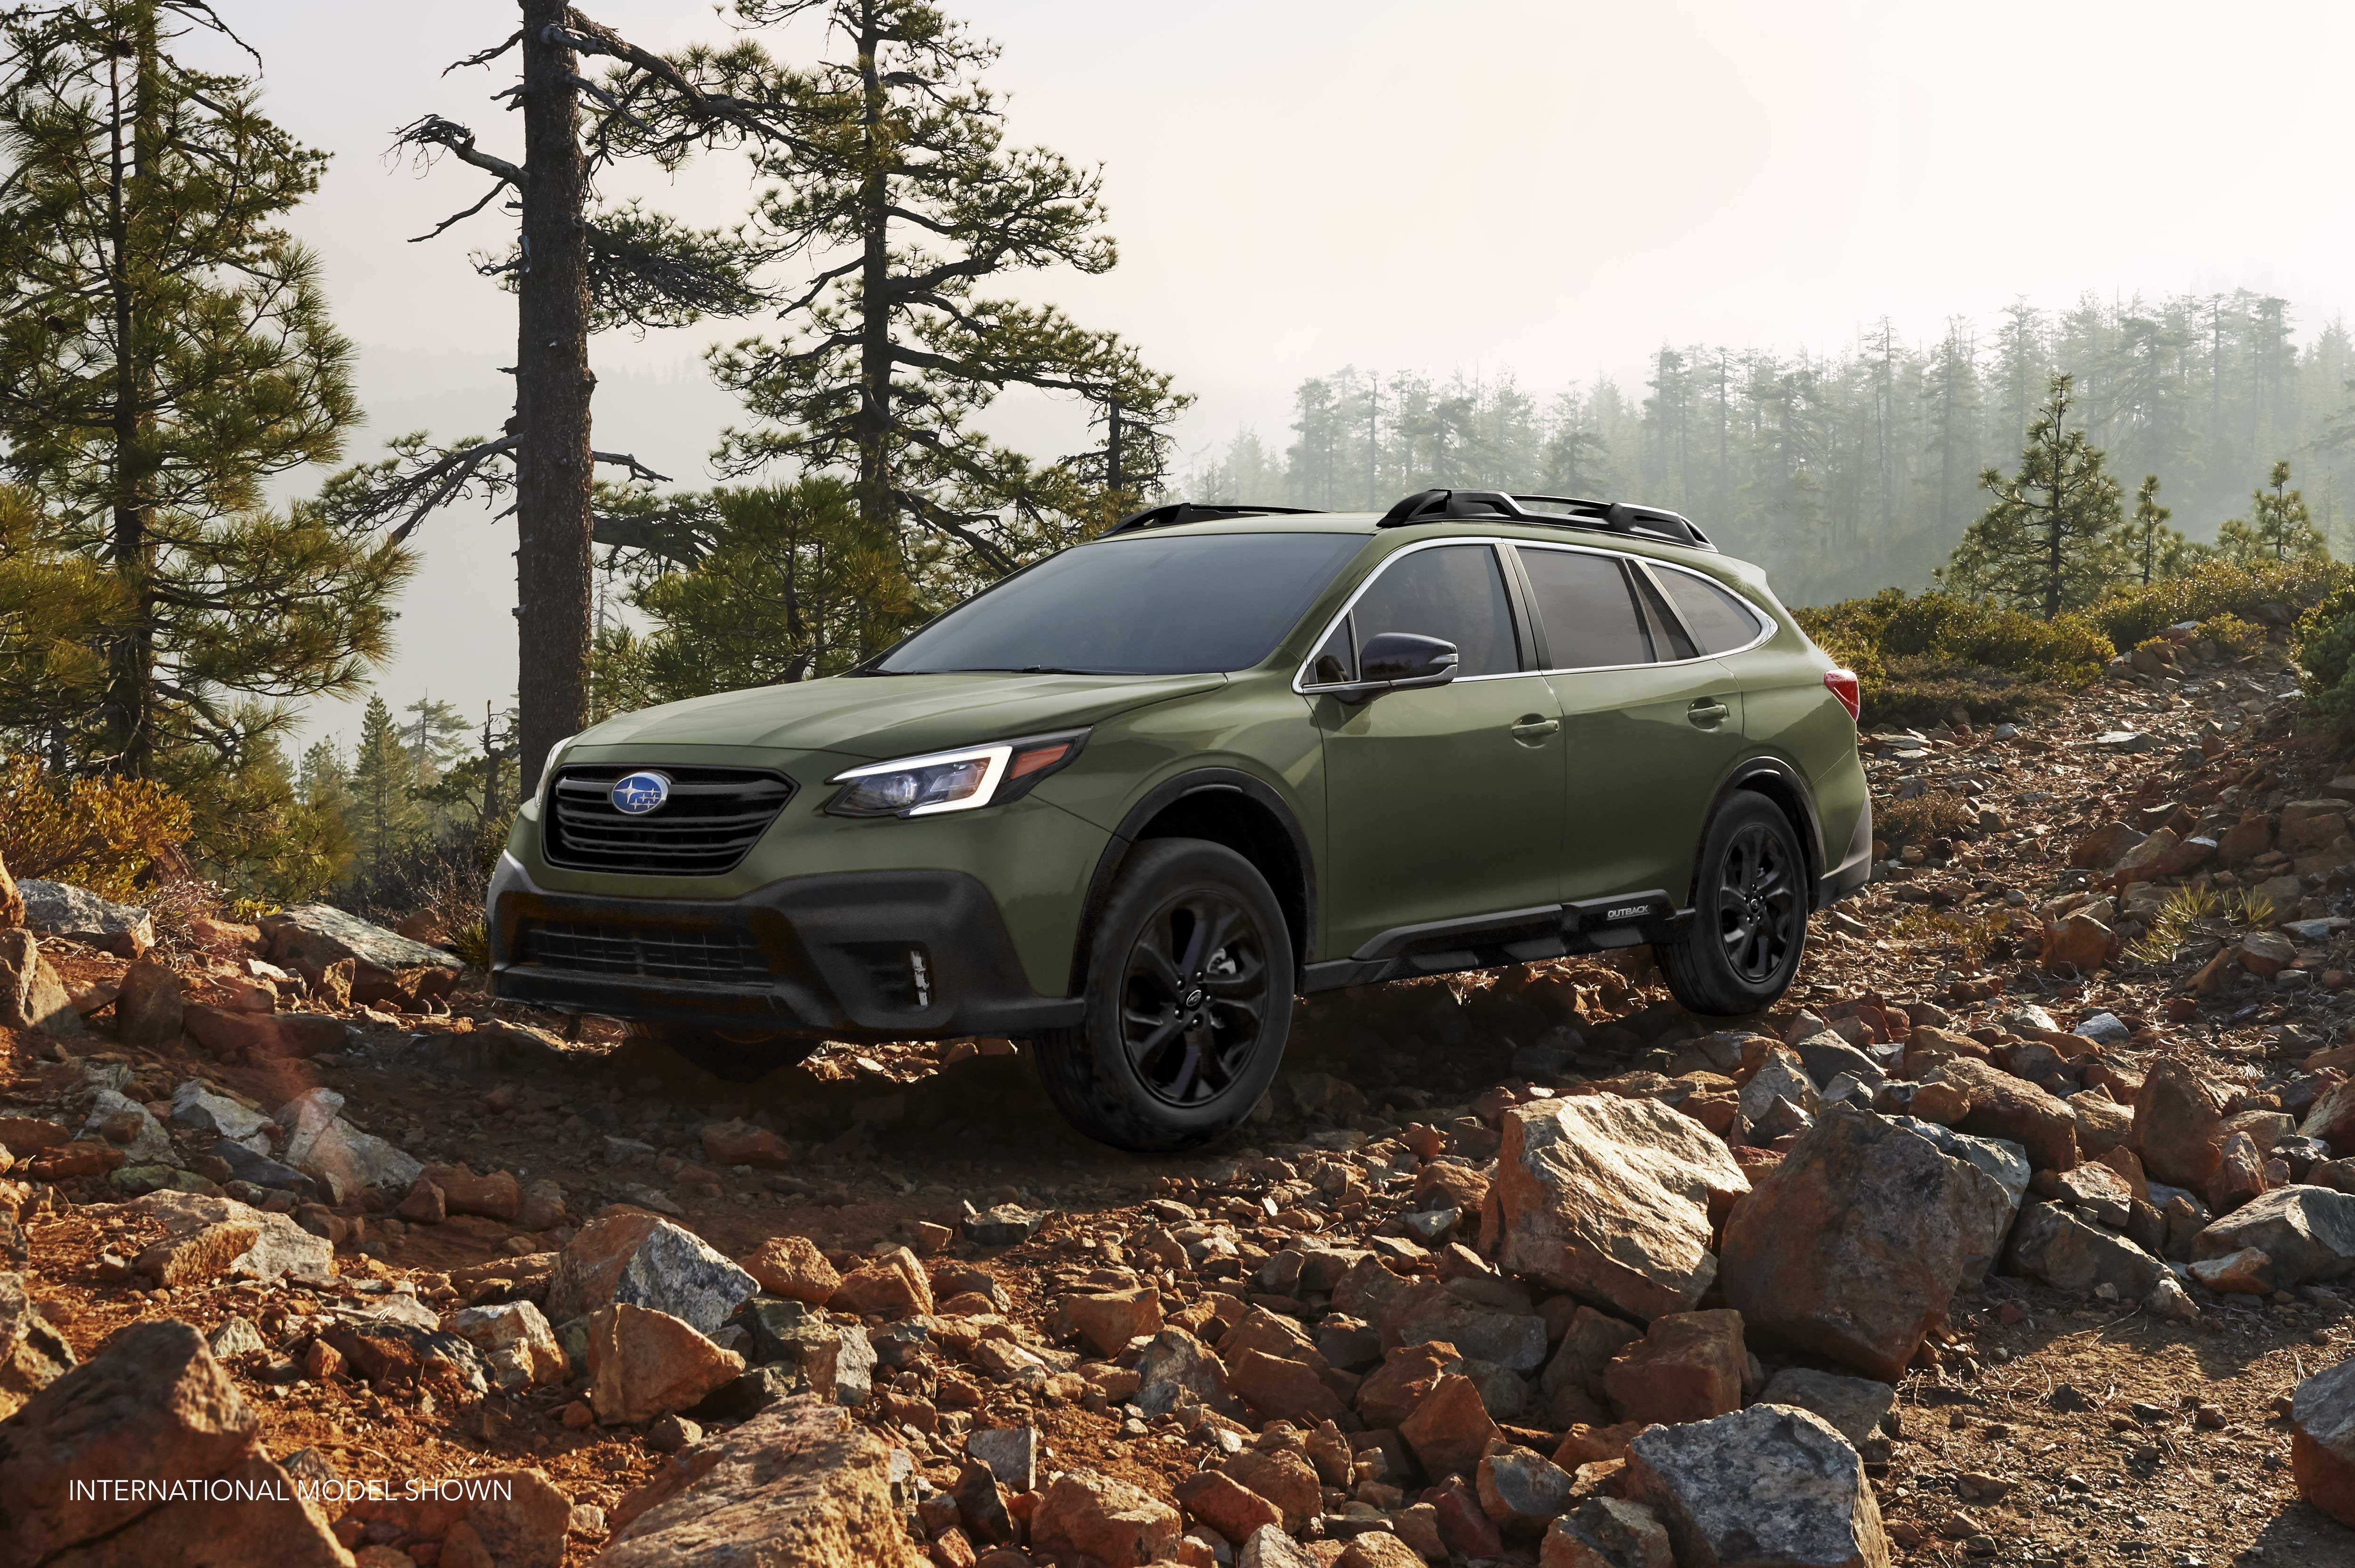 30 New Subaru Hybrid Outback 2020 Images for Subaru Hybrid Outback 2020